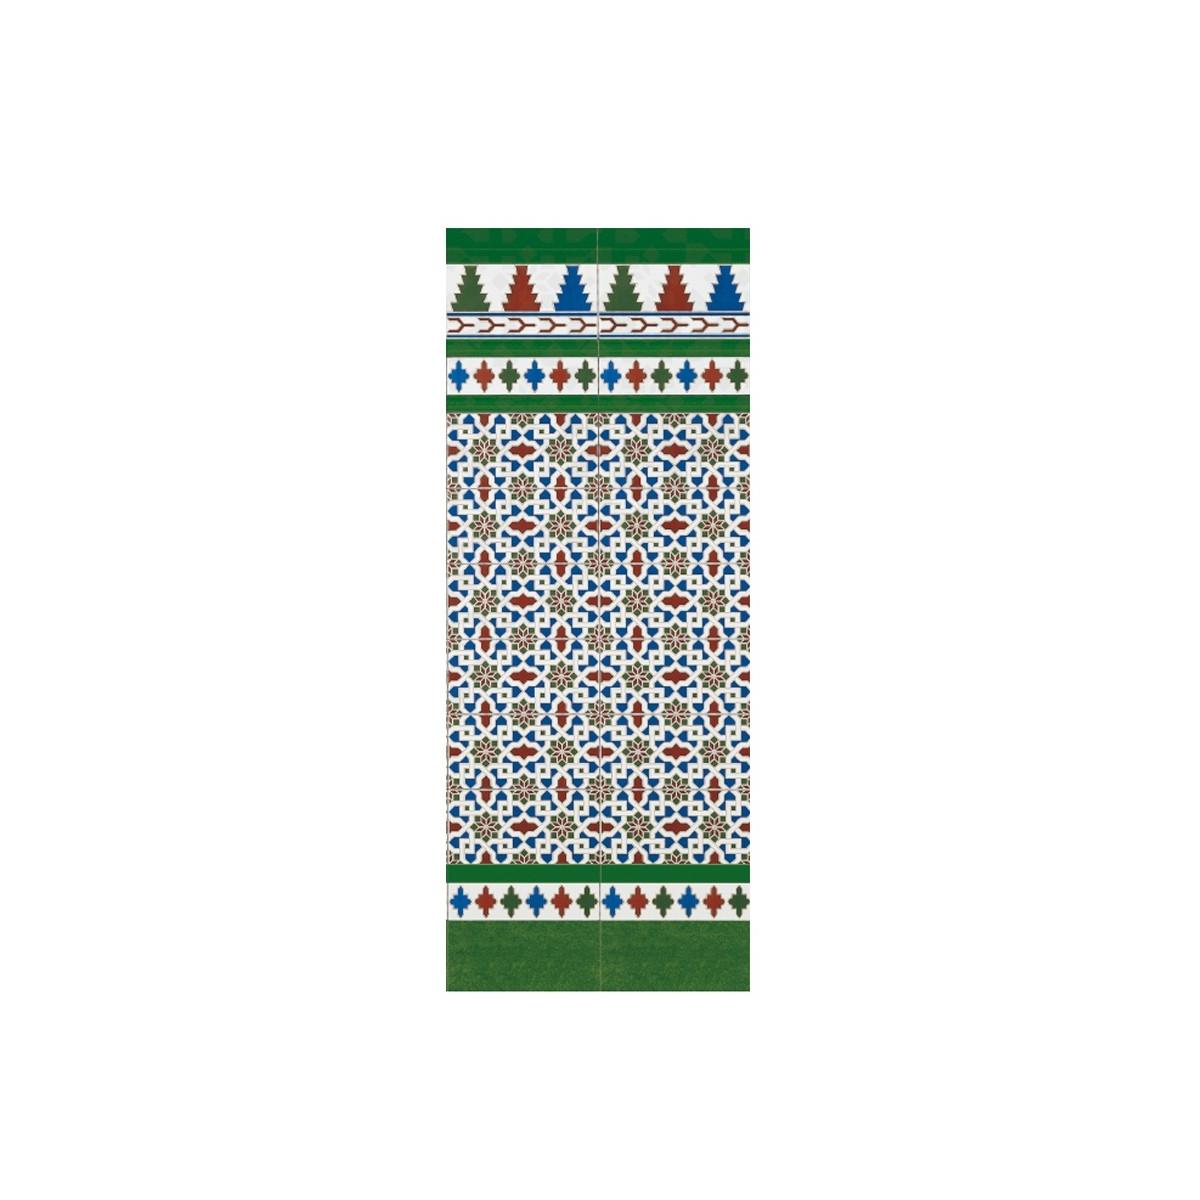 Tira Verde 3x28 (ud) - Serie Alhambra - Marca Mainzu